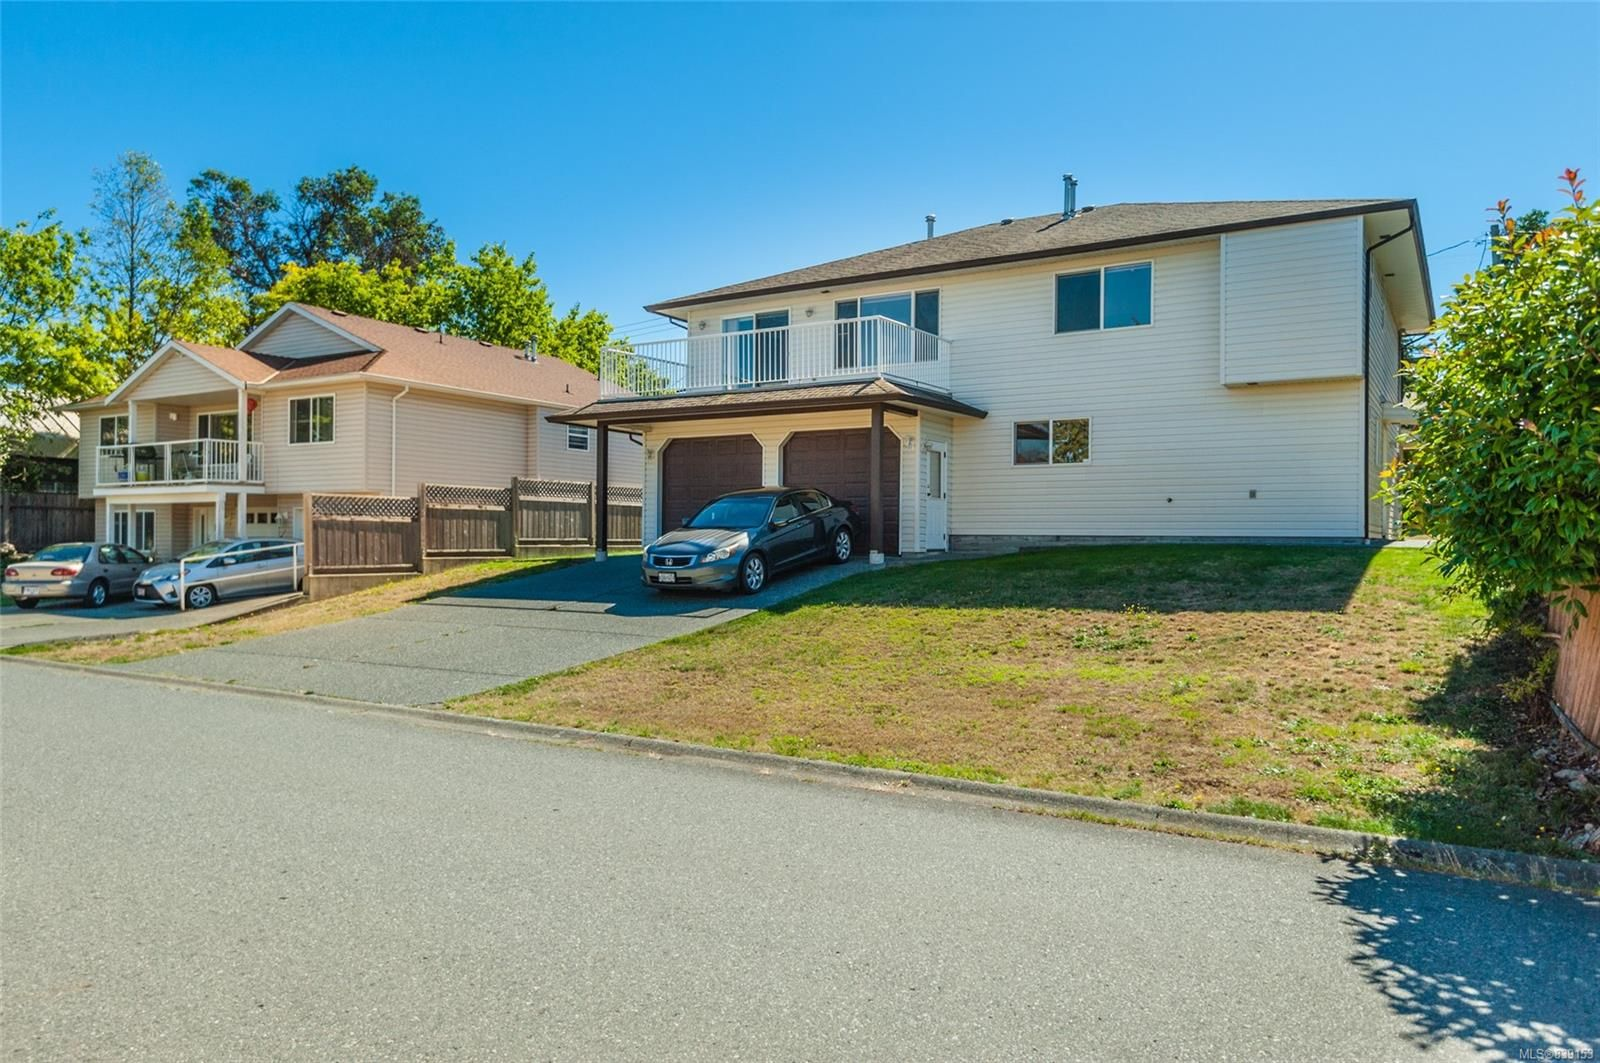 Photo 26: Photos: 6412 Dover Rd in NANAIMO: Na North Nanaimo House for sale (Nanaimo)  : MLS®# 839153